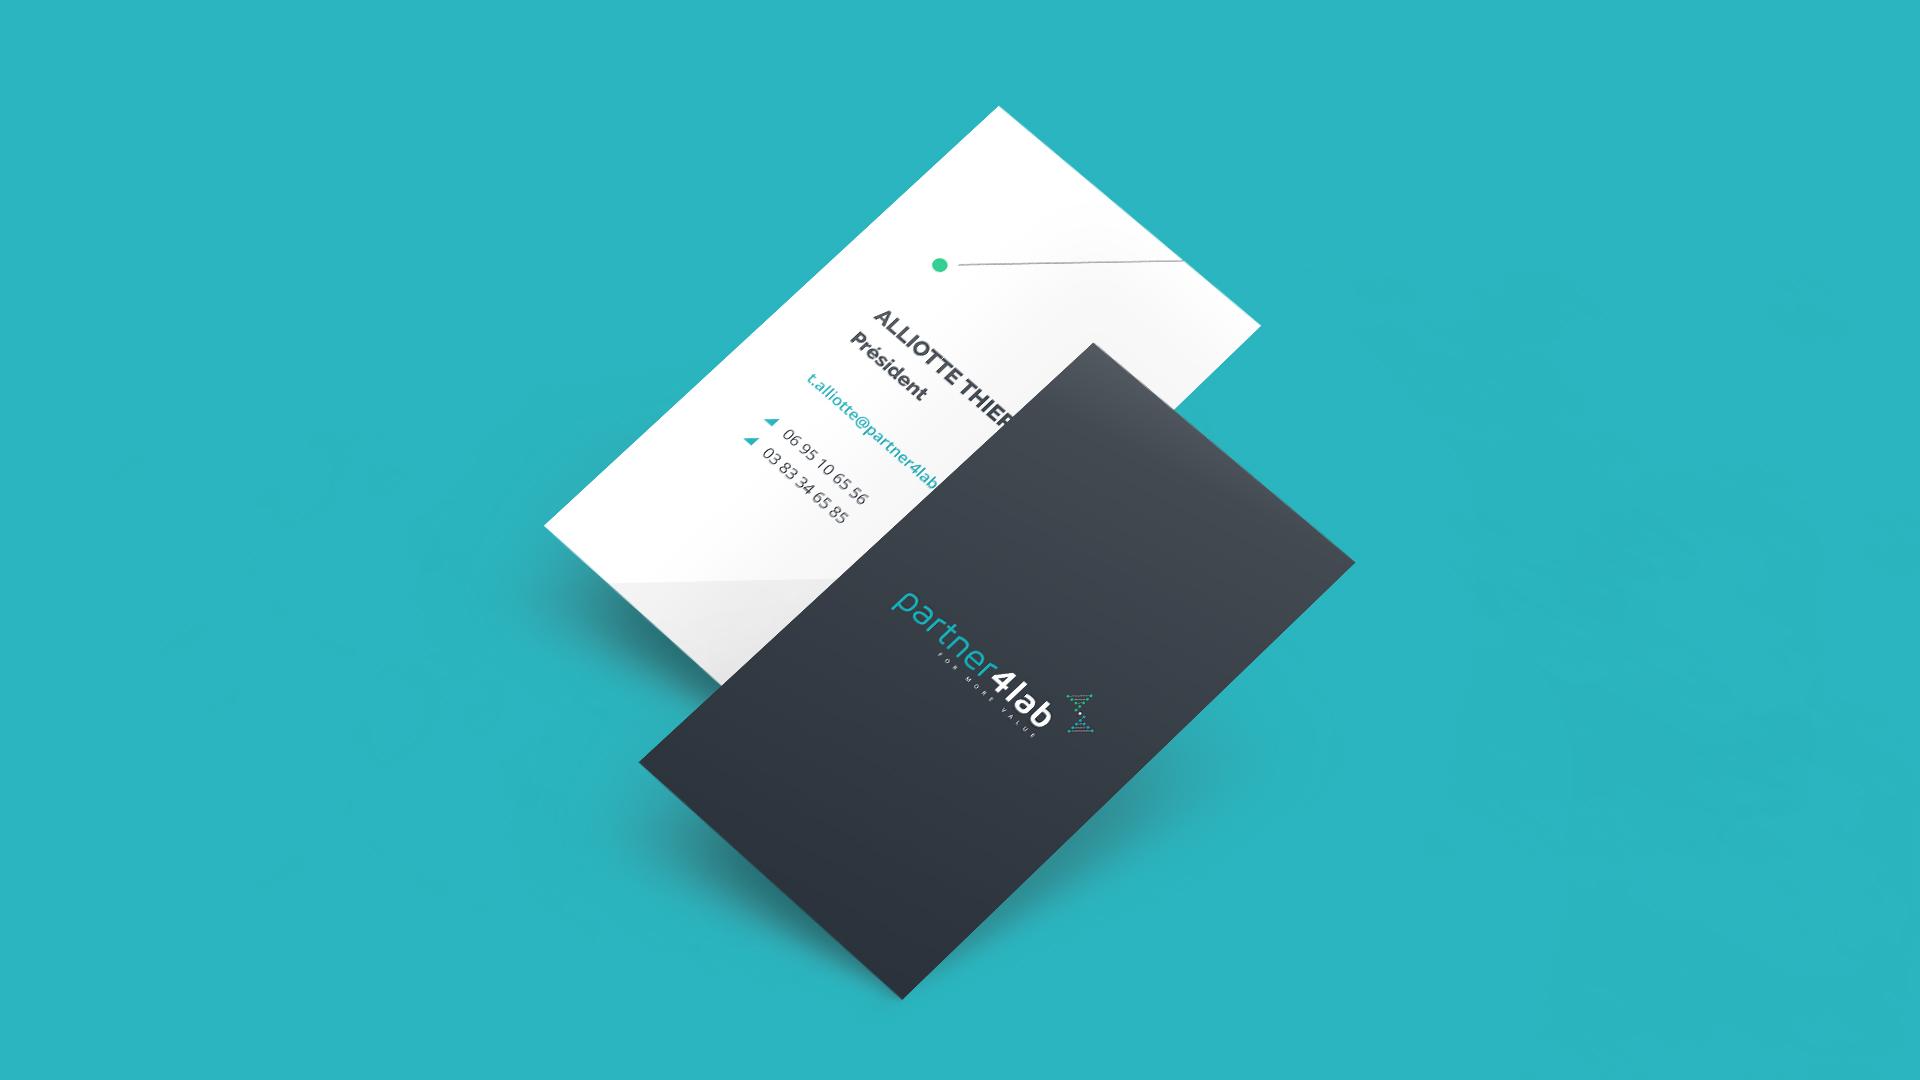 branding-partner4lab-une